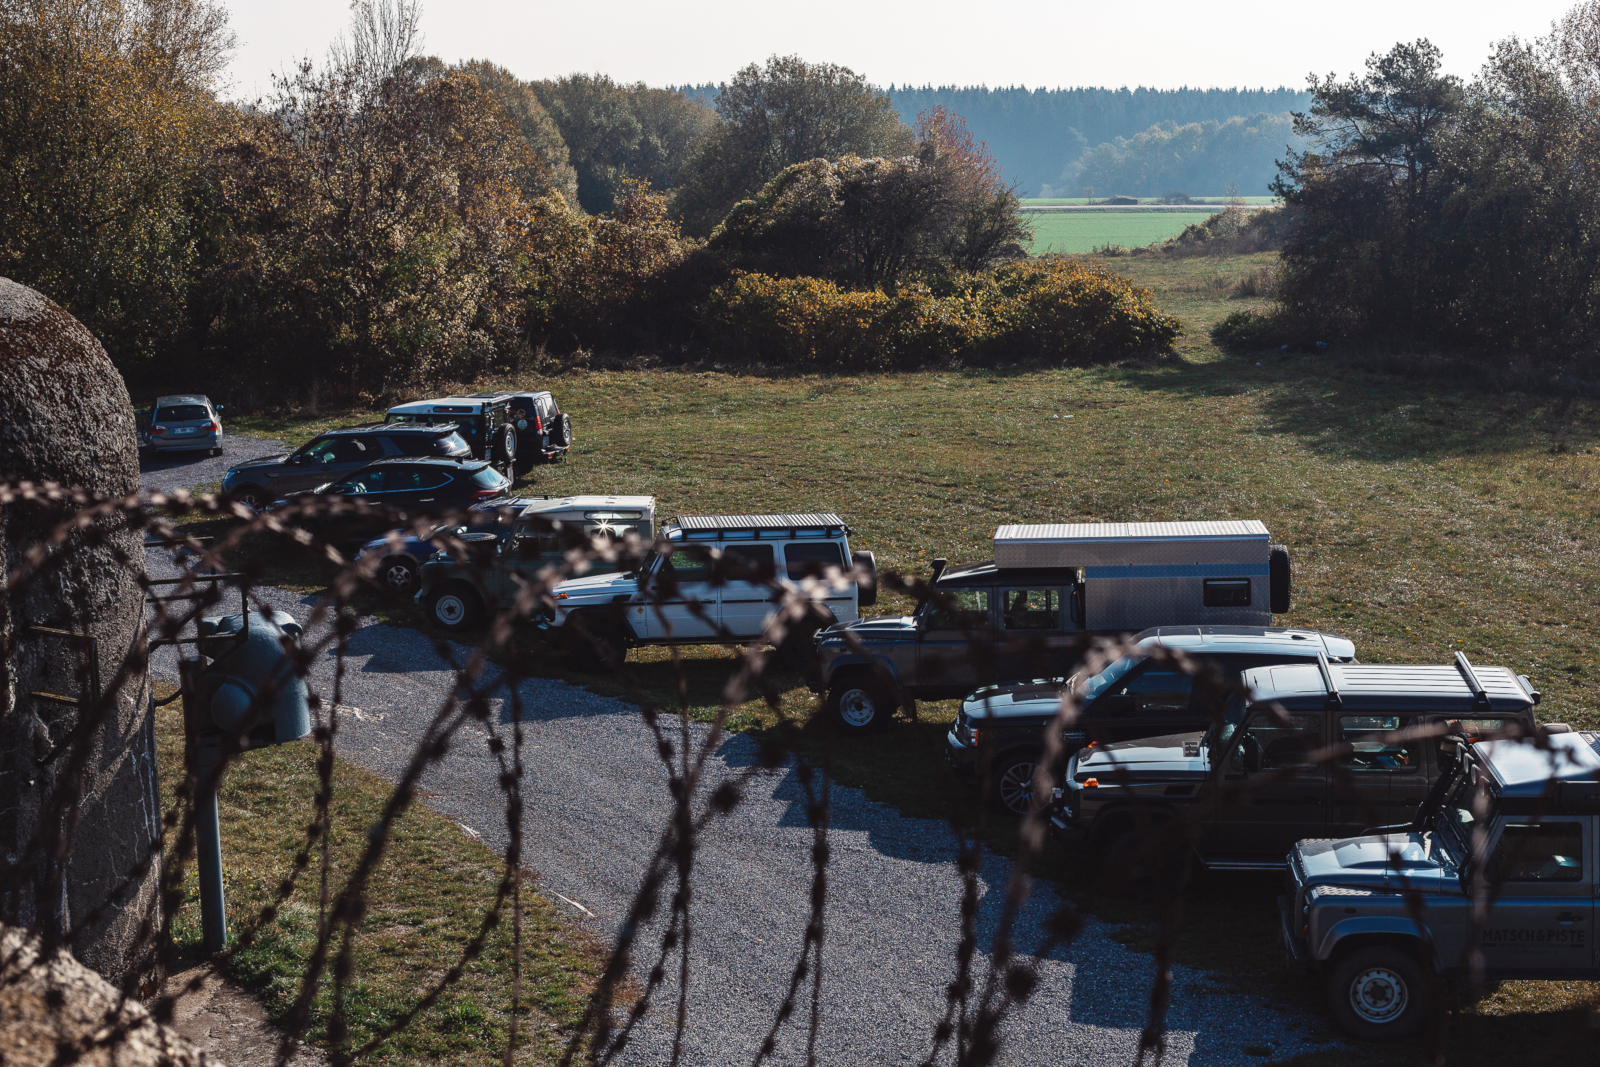 Verdun-Maginot-Tour 2018 - Auf einem der Maginot-Bunker.